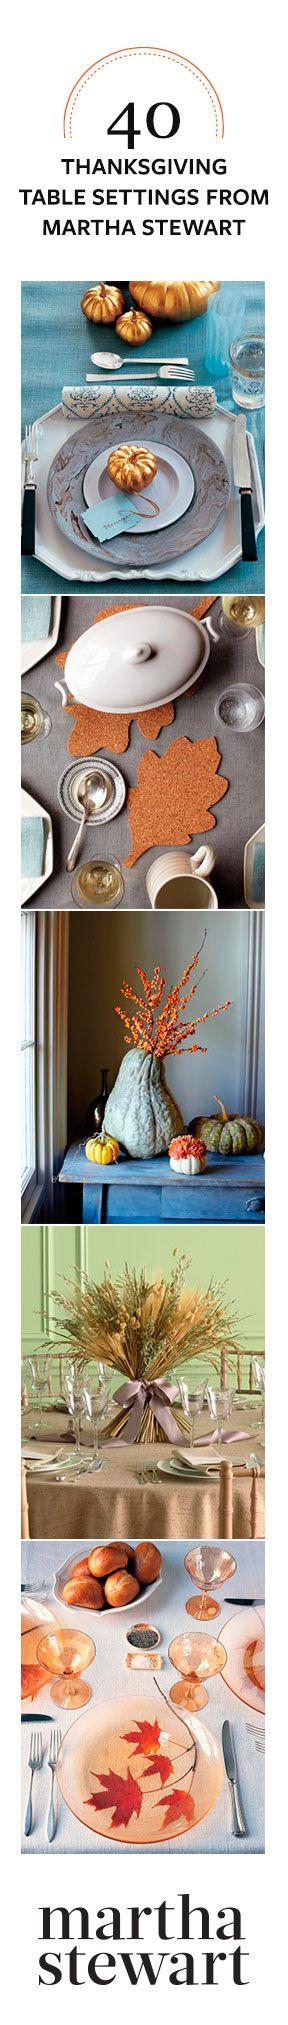 40 Thanksgiving Table Settings from Martha Stewart